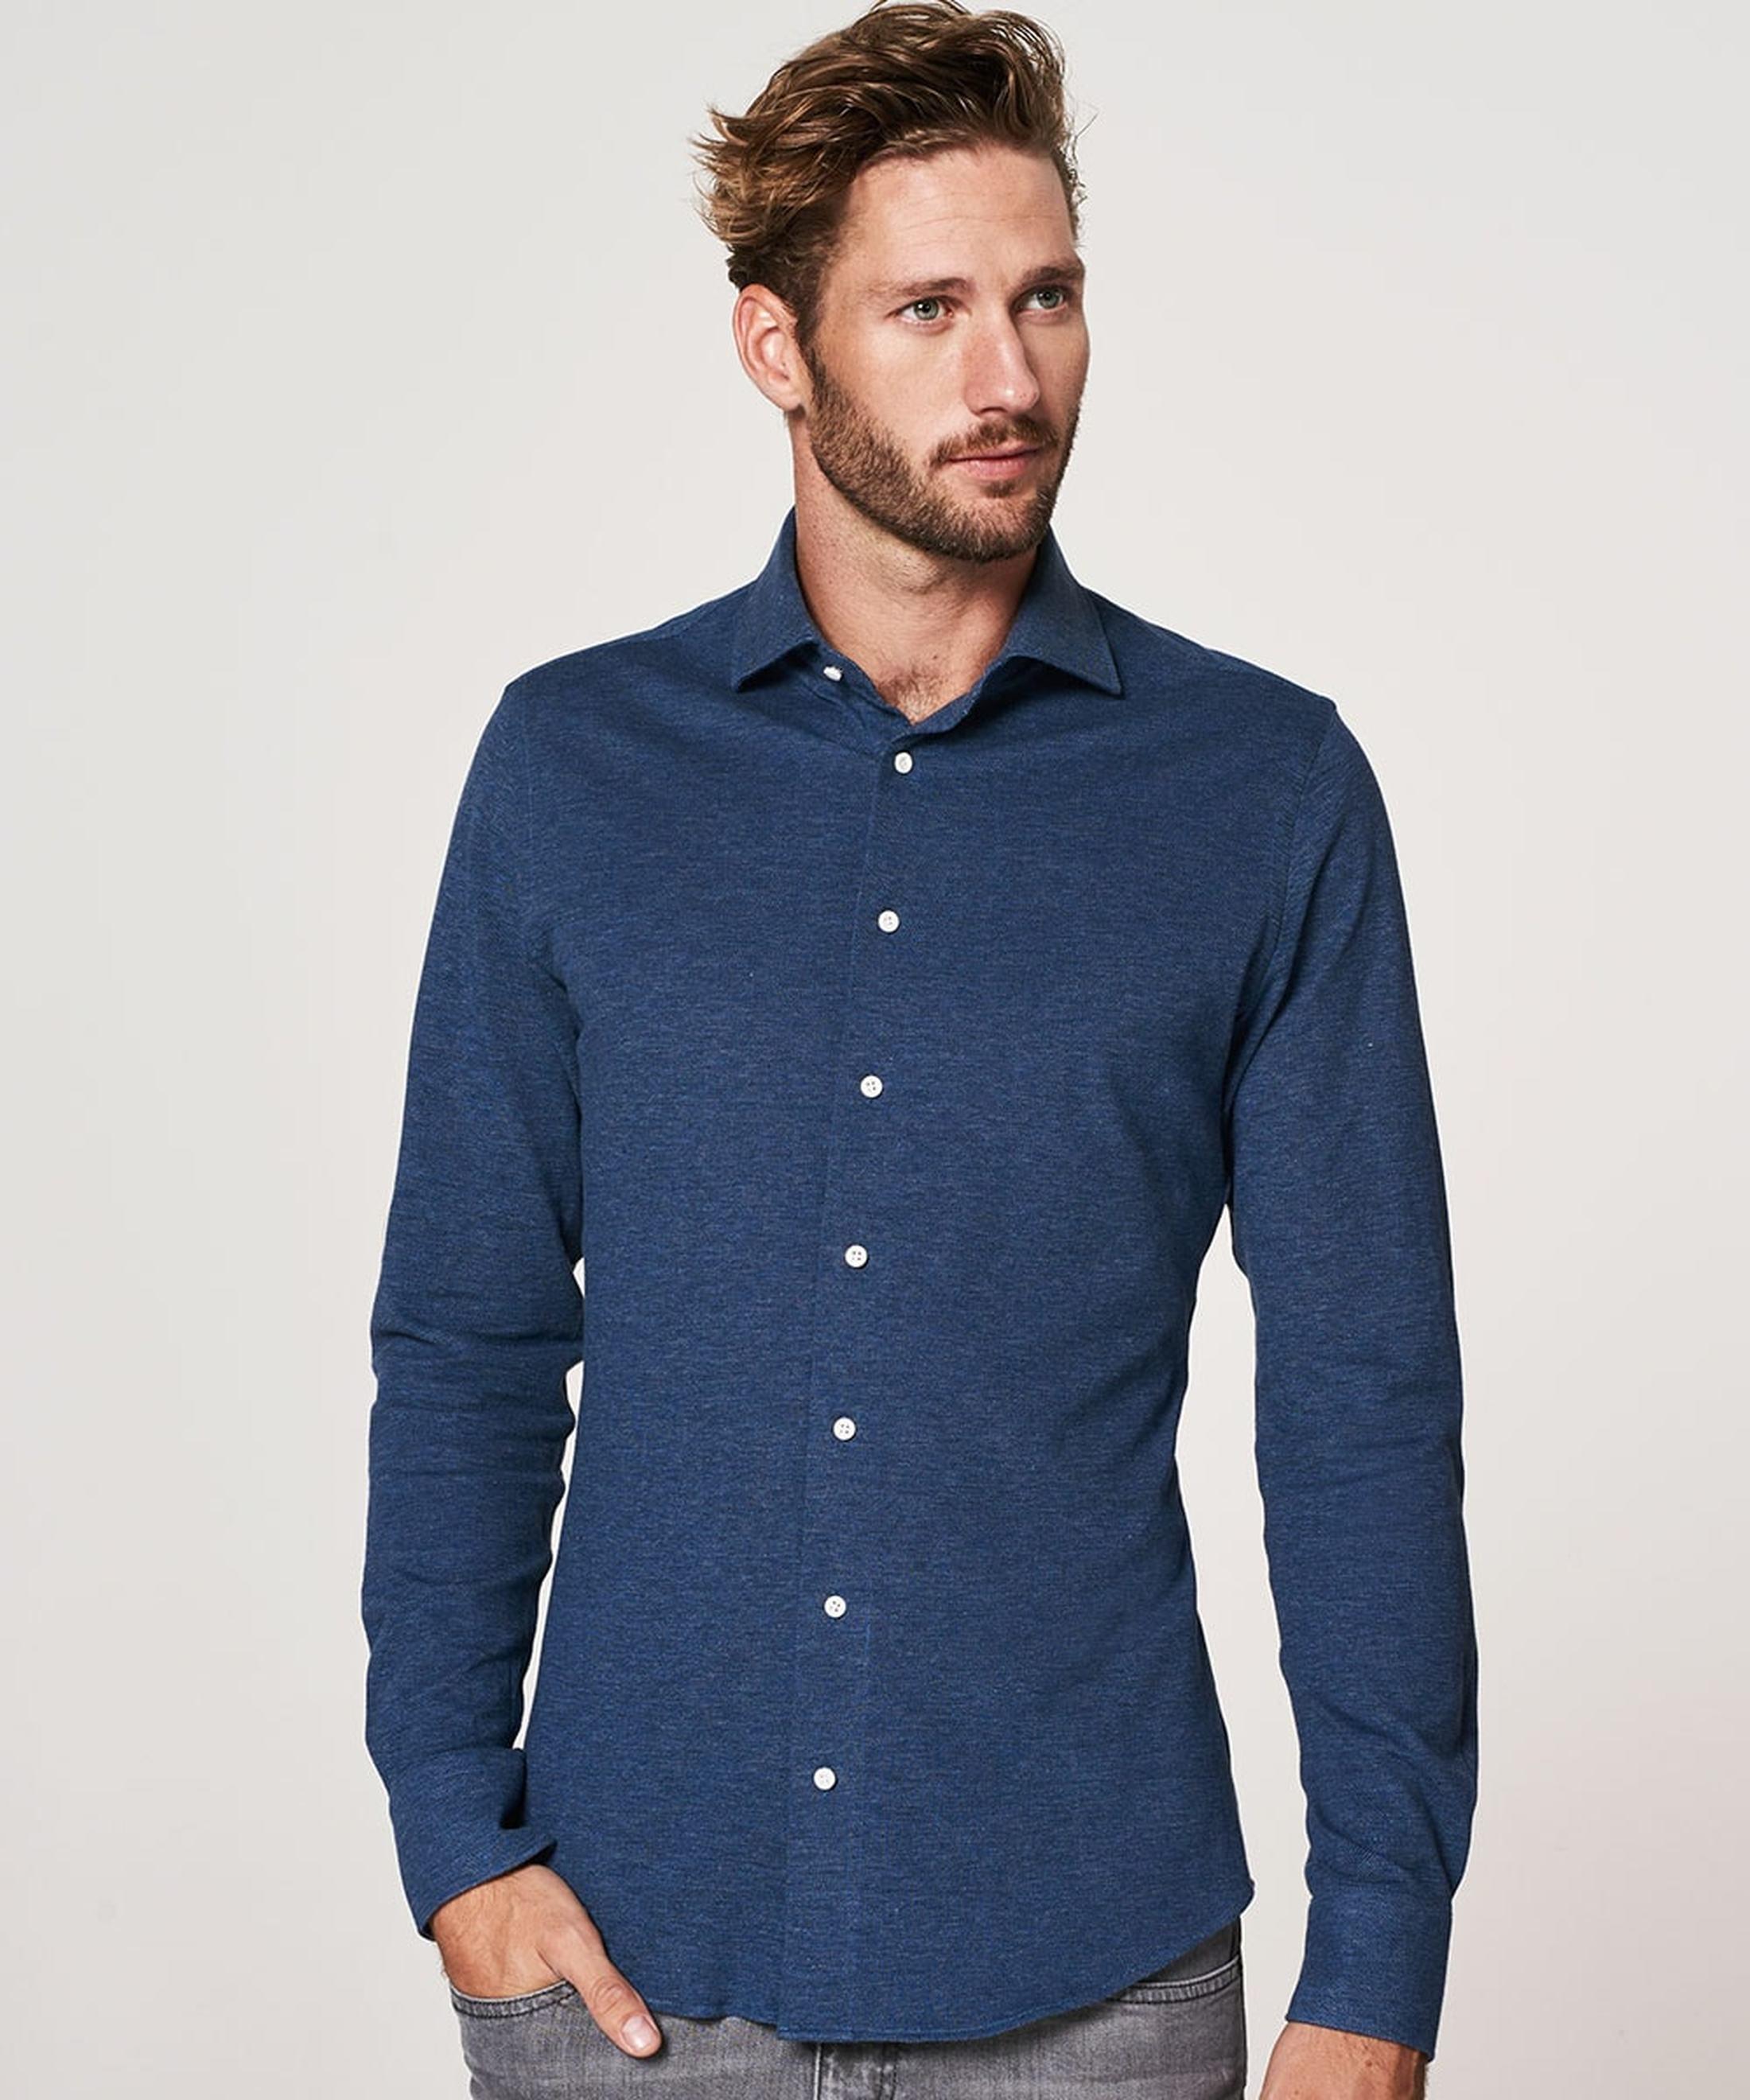 Profuomo Shirt Knitted Slim Fit Indigo Blue